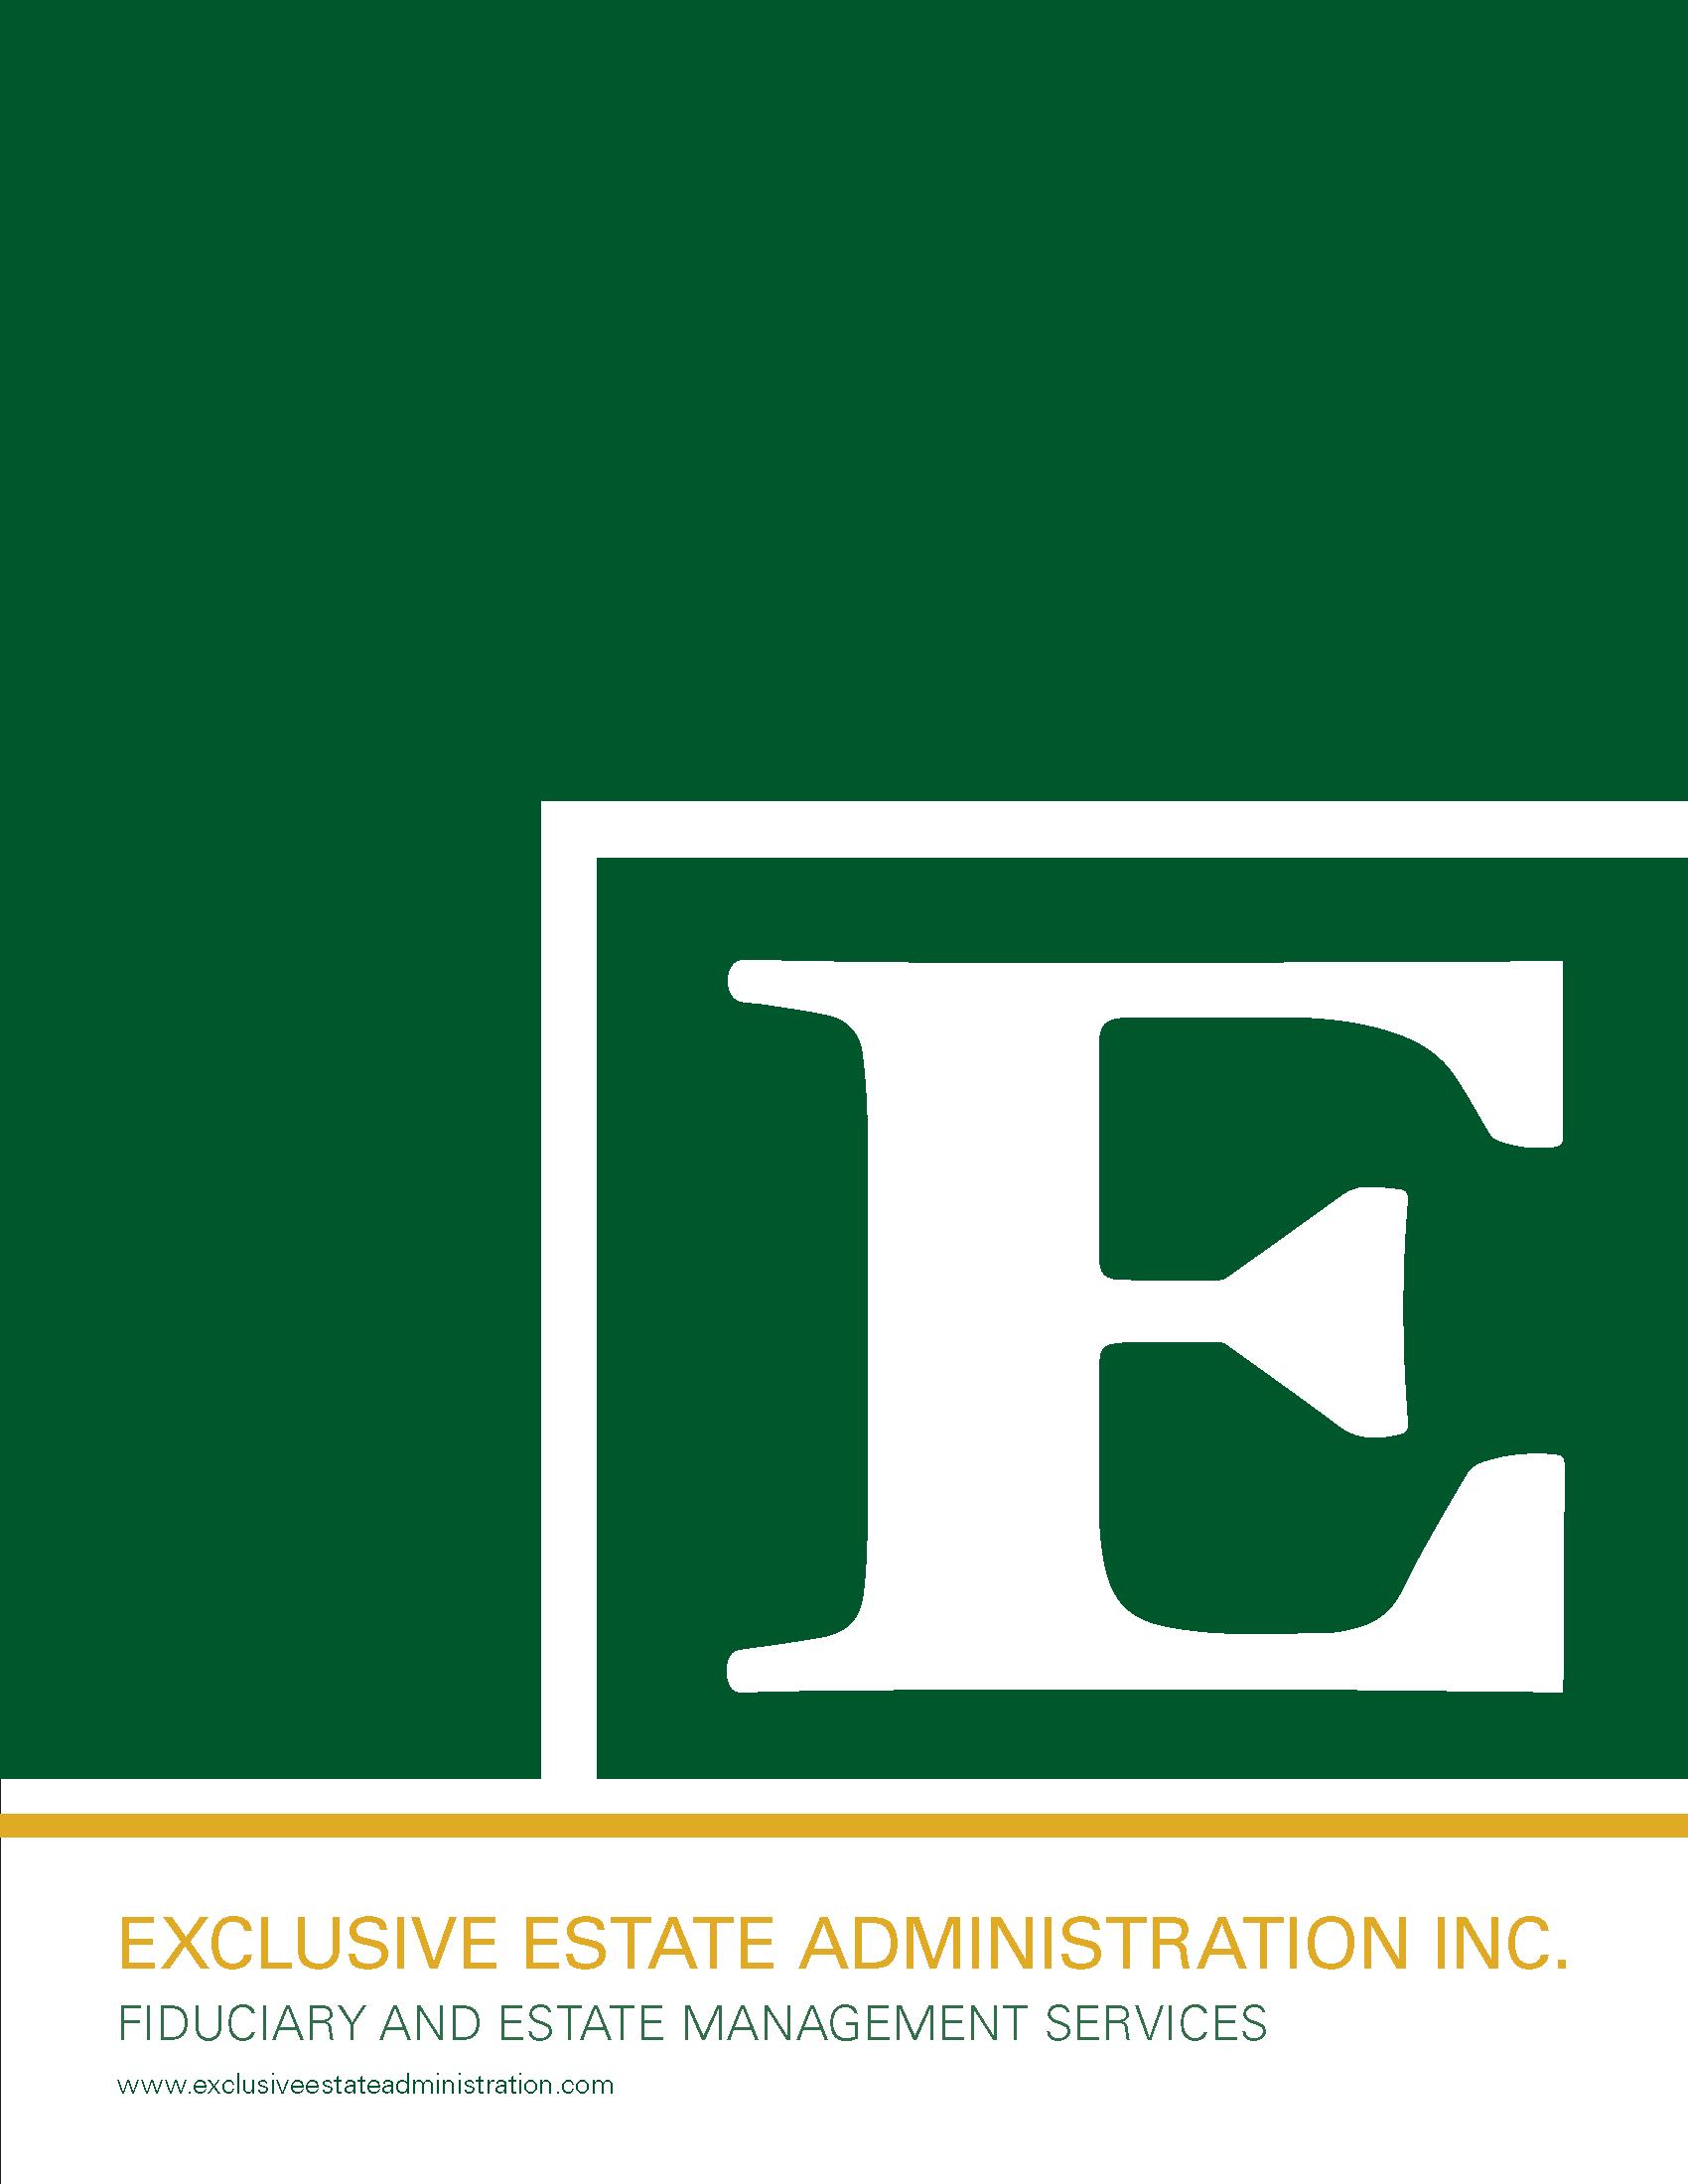 www.eeadmin.com